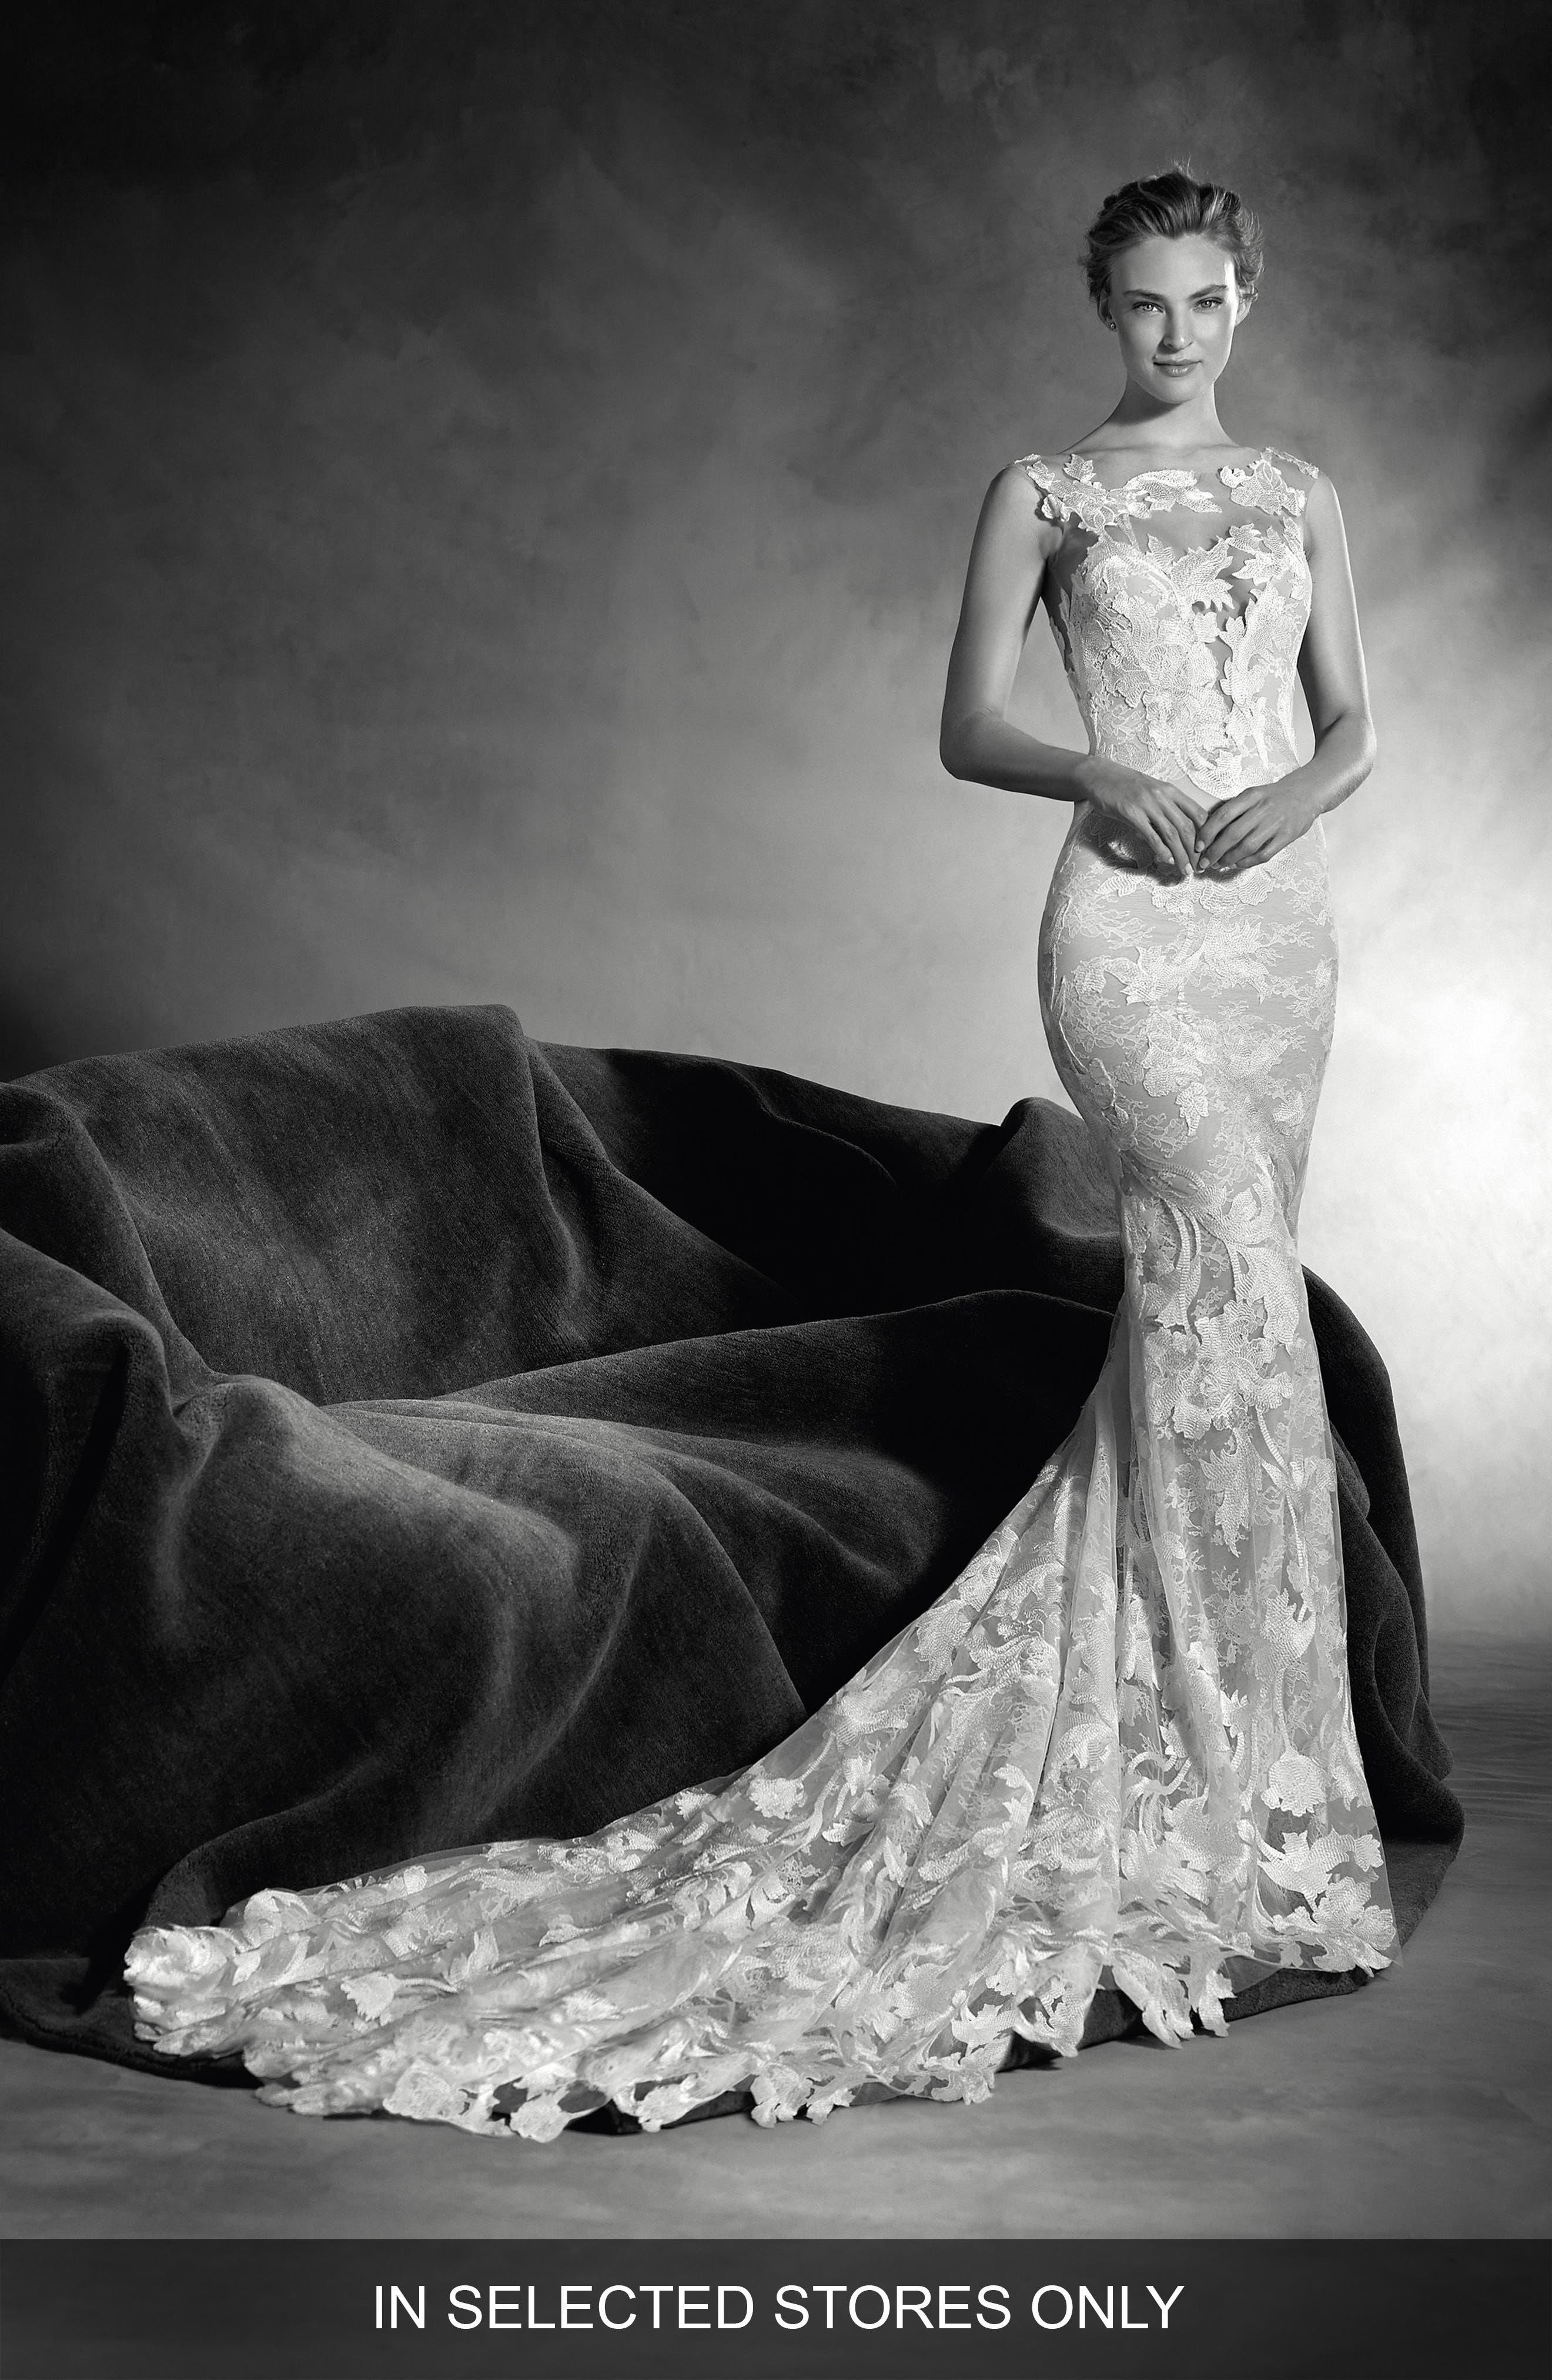 Alternate Image 1 Selected - Atelier Pronovias Niebla Embellished Mermaid Gown